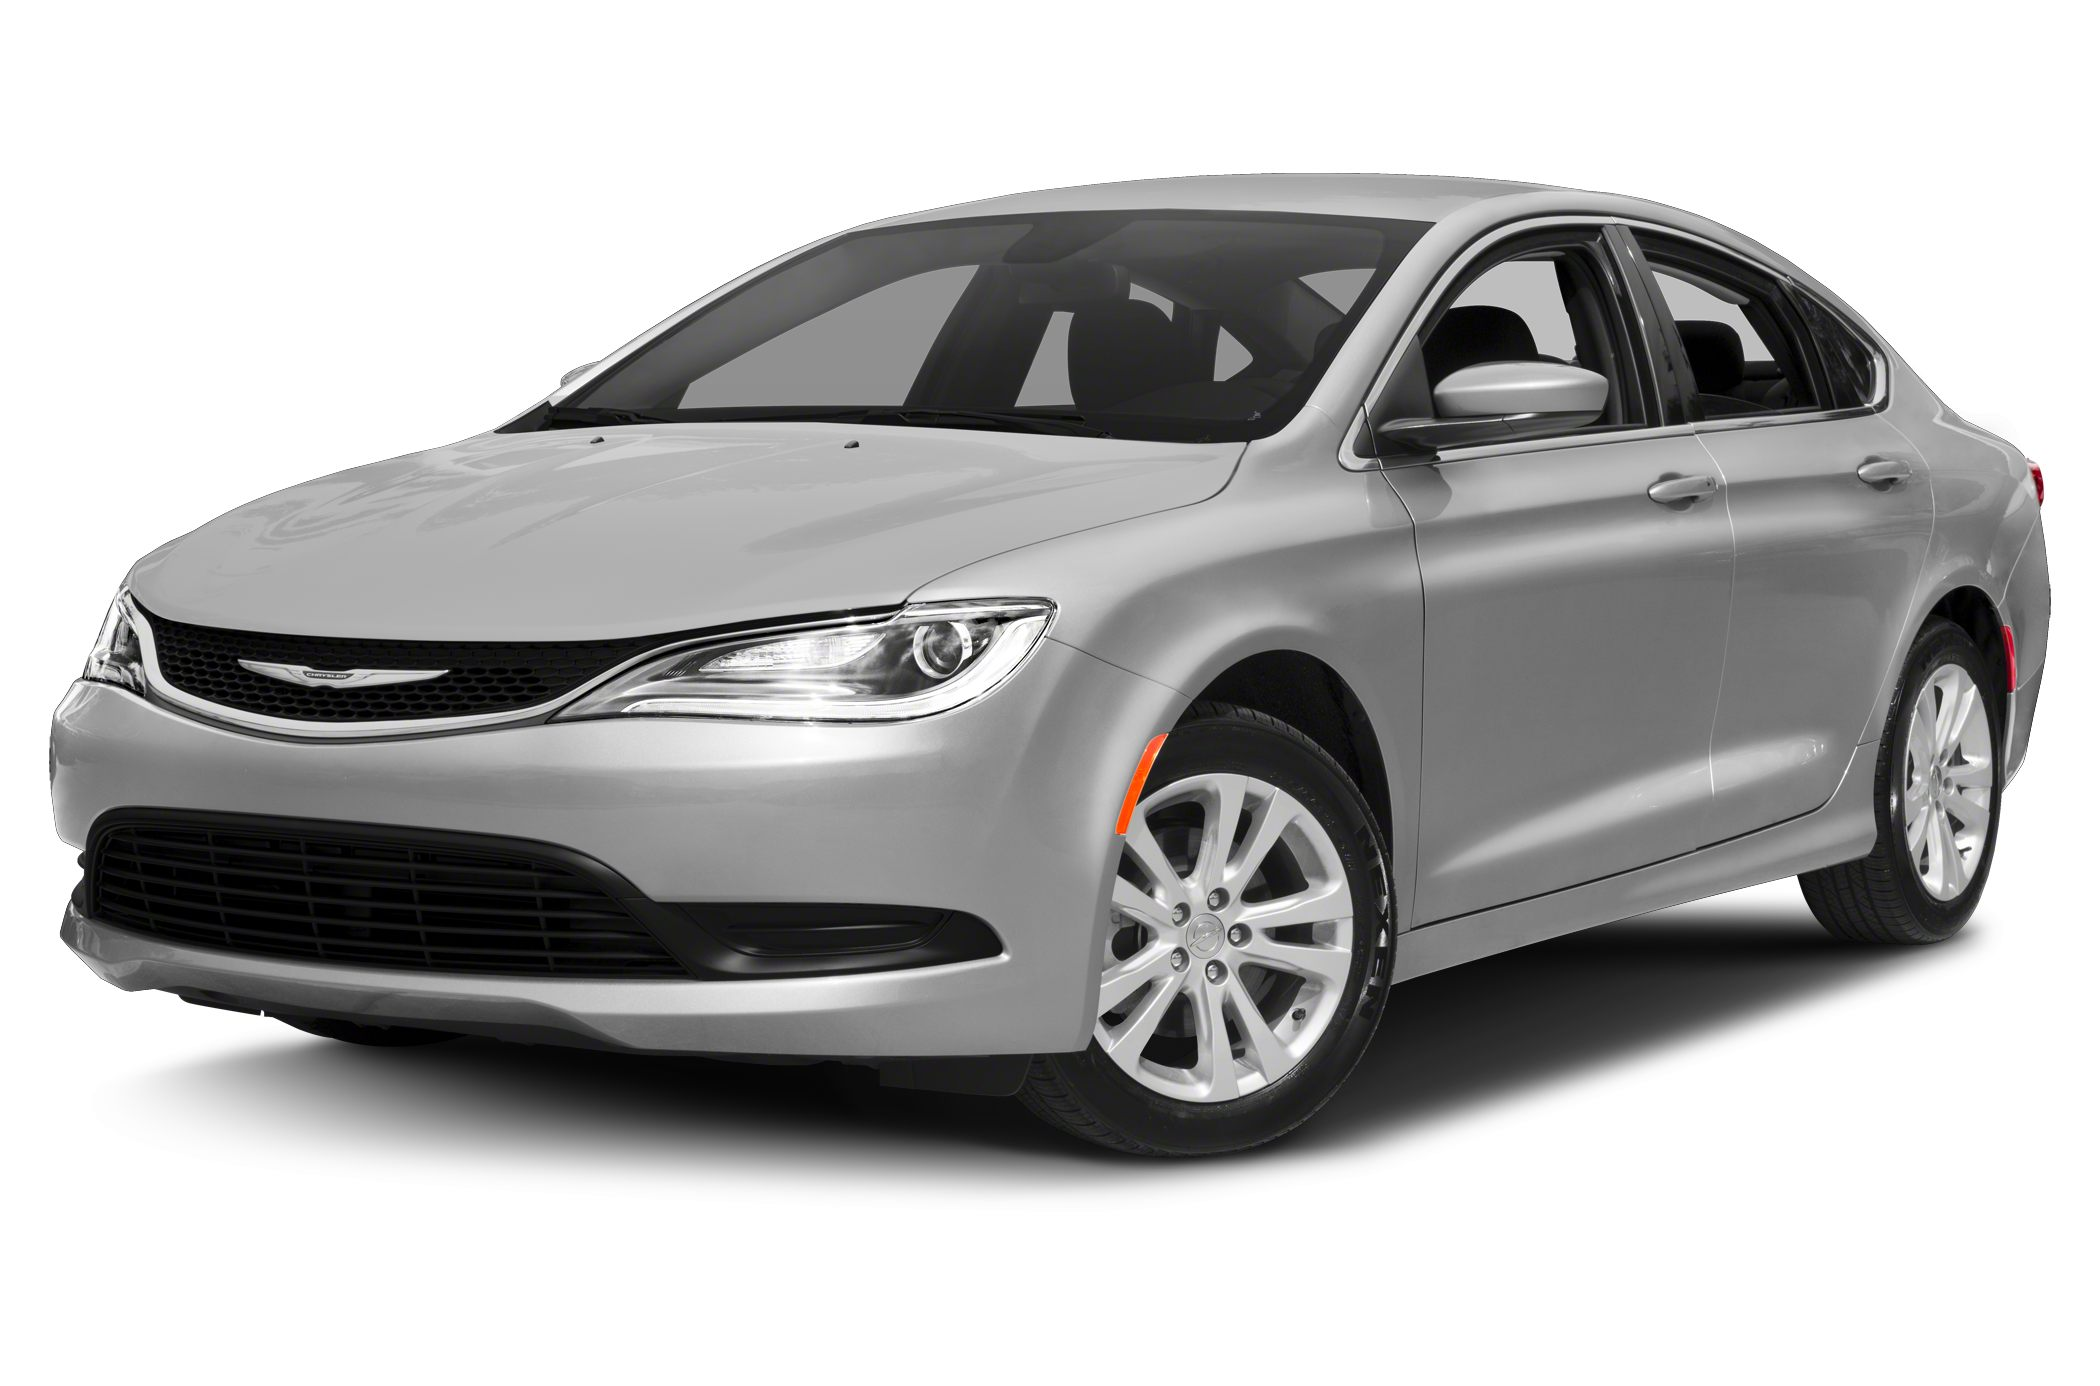 2017 Chrysler 200 Reviews, Specs and Prices   Cars.com